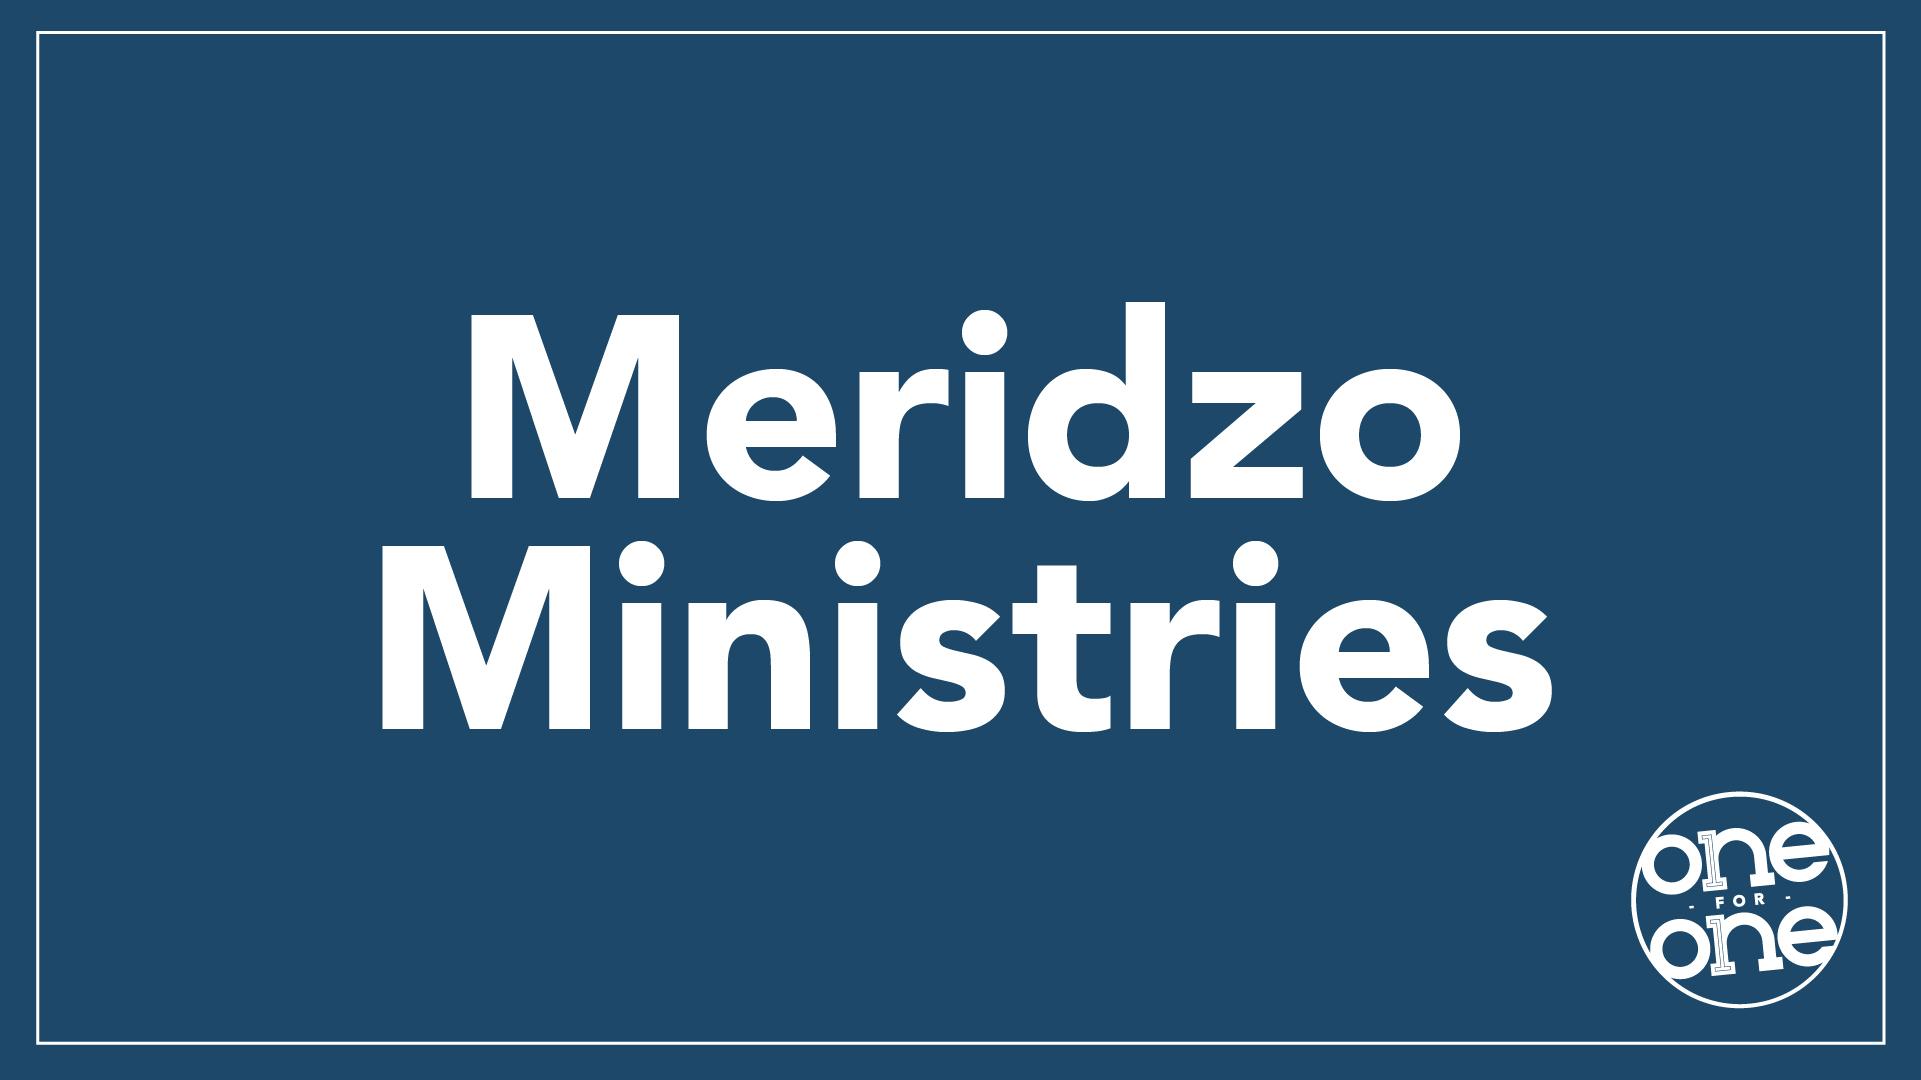 One for One: Meridzo Ministries